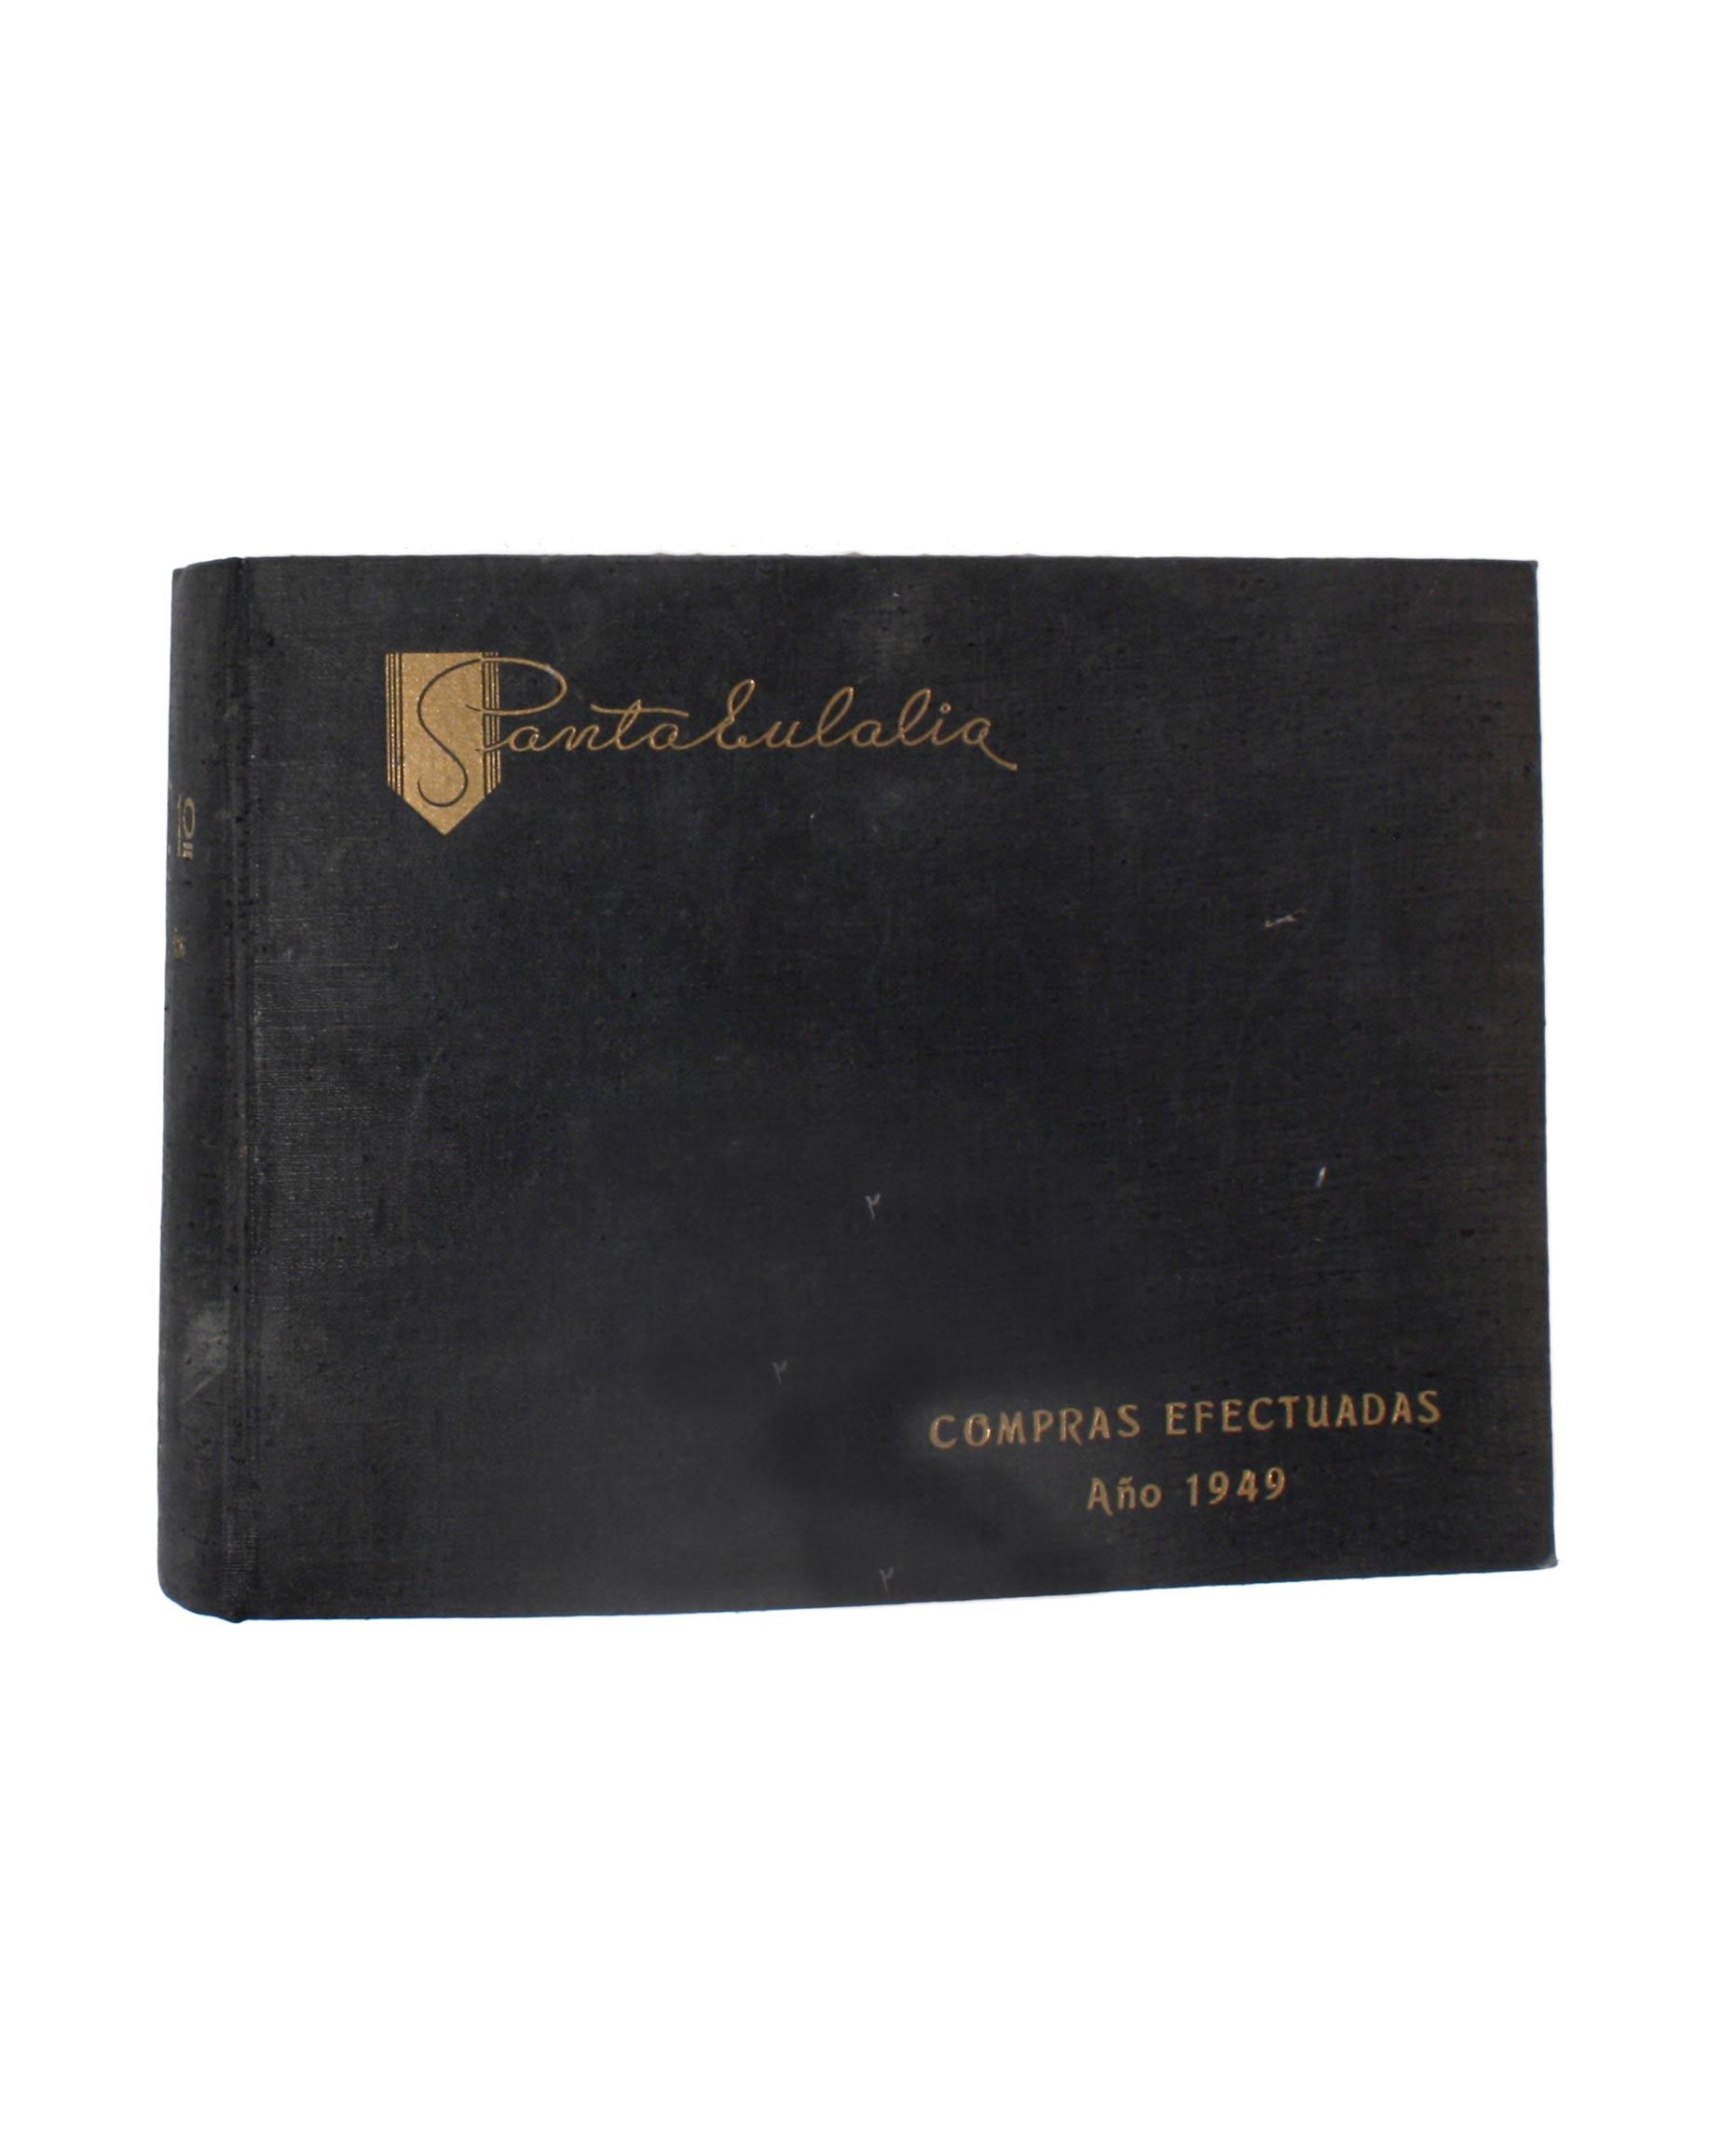 SANTA EULALIA Winter 1949/2 textile book